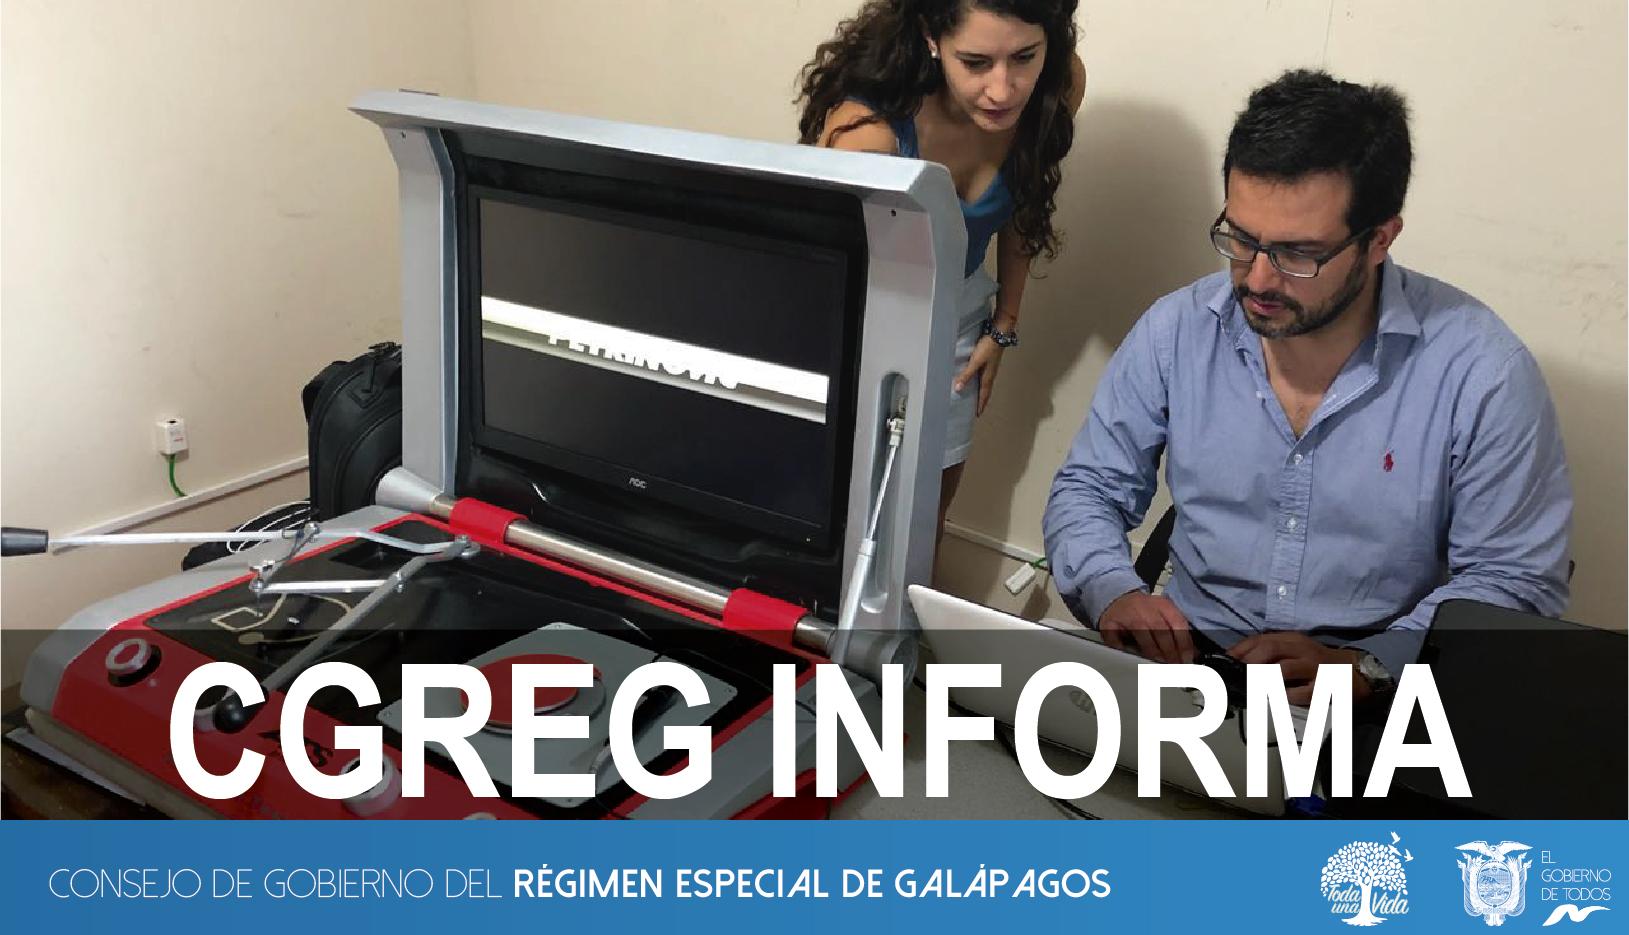 CGREG infoma-01